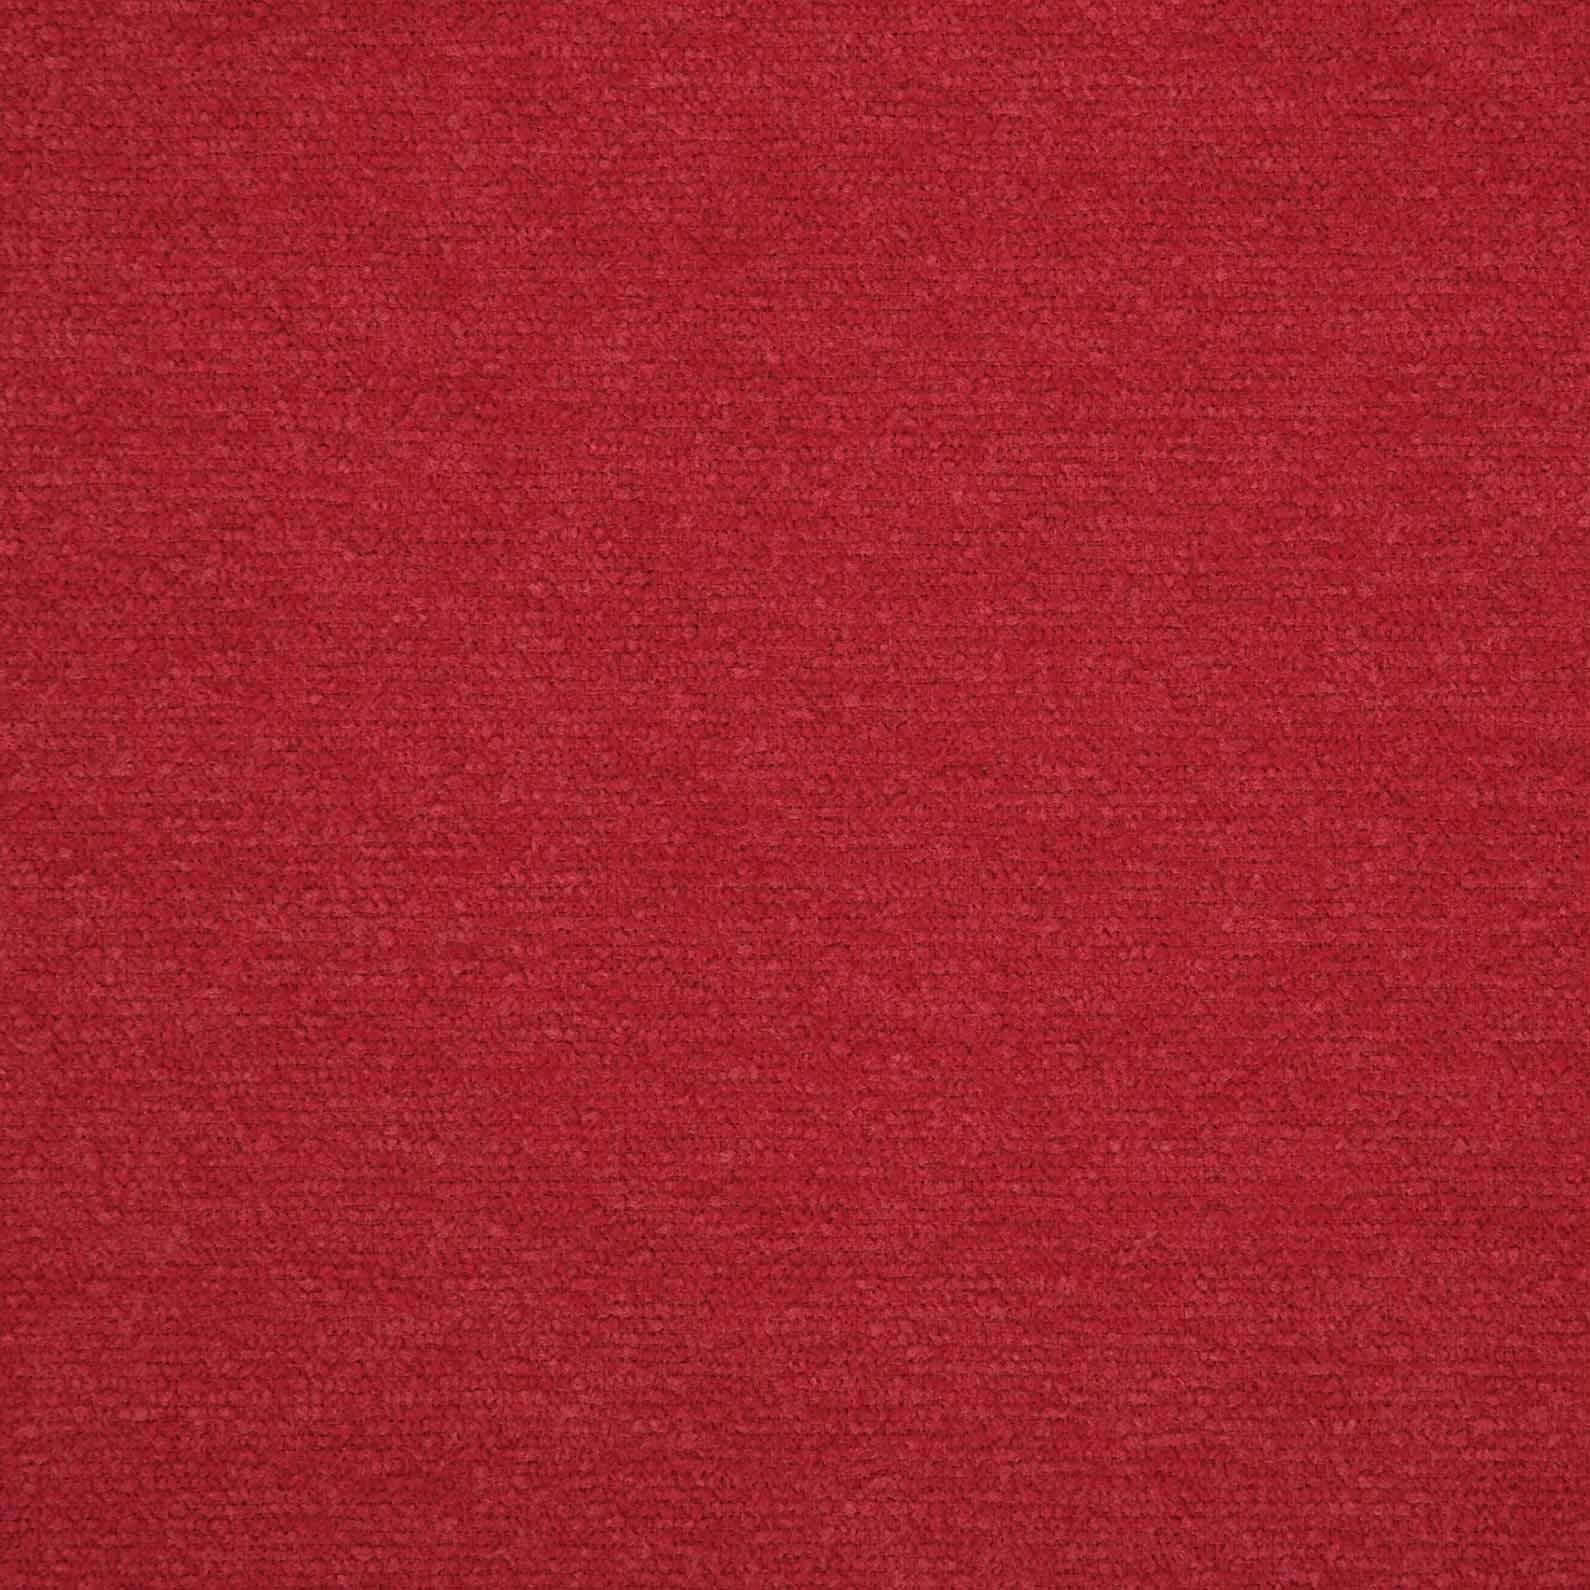 Loft Crimson